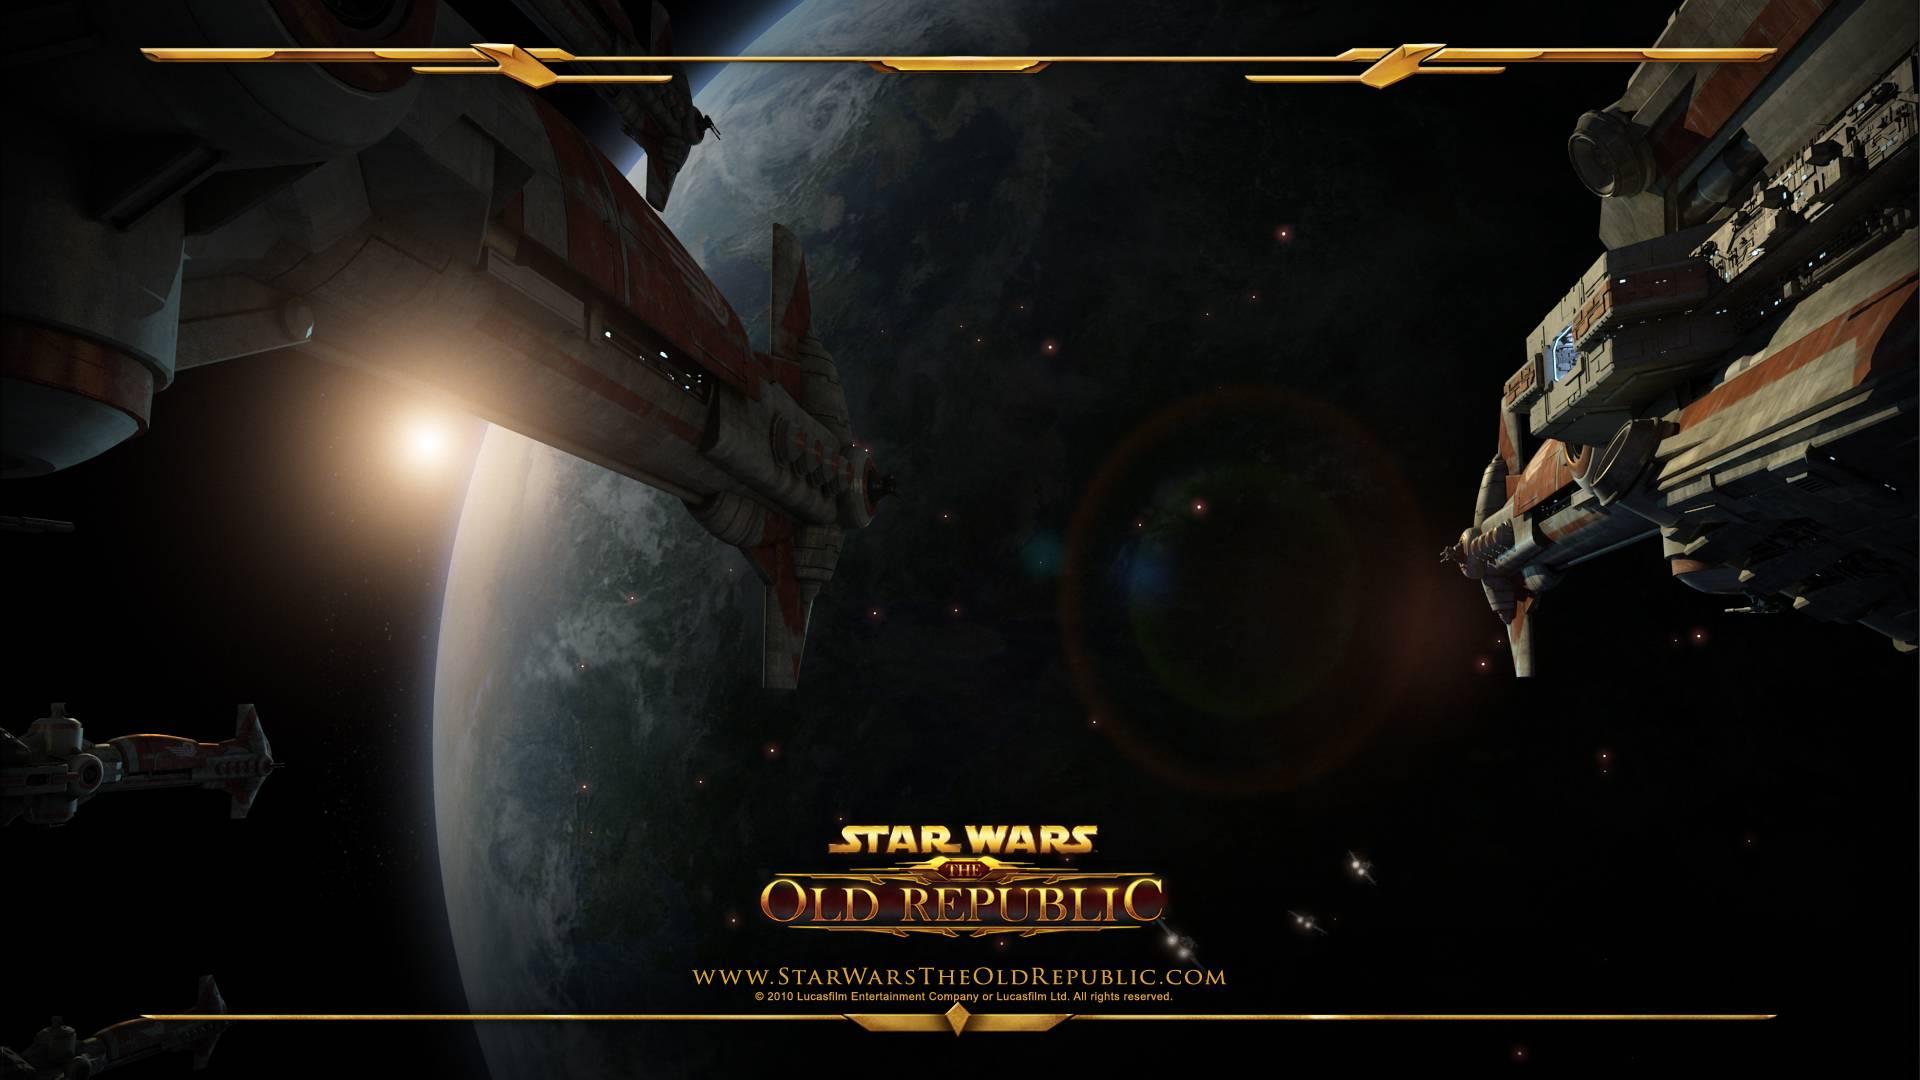 Wallpapers De Star Wars The Old Republic